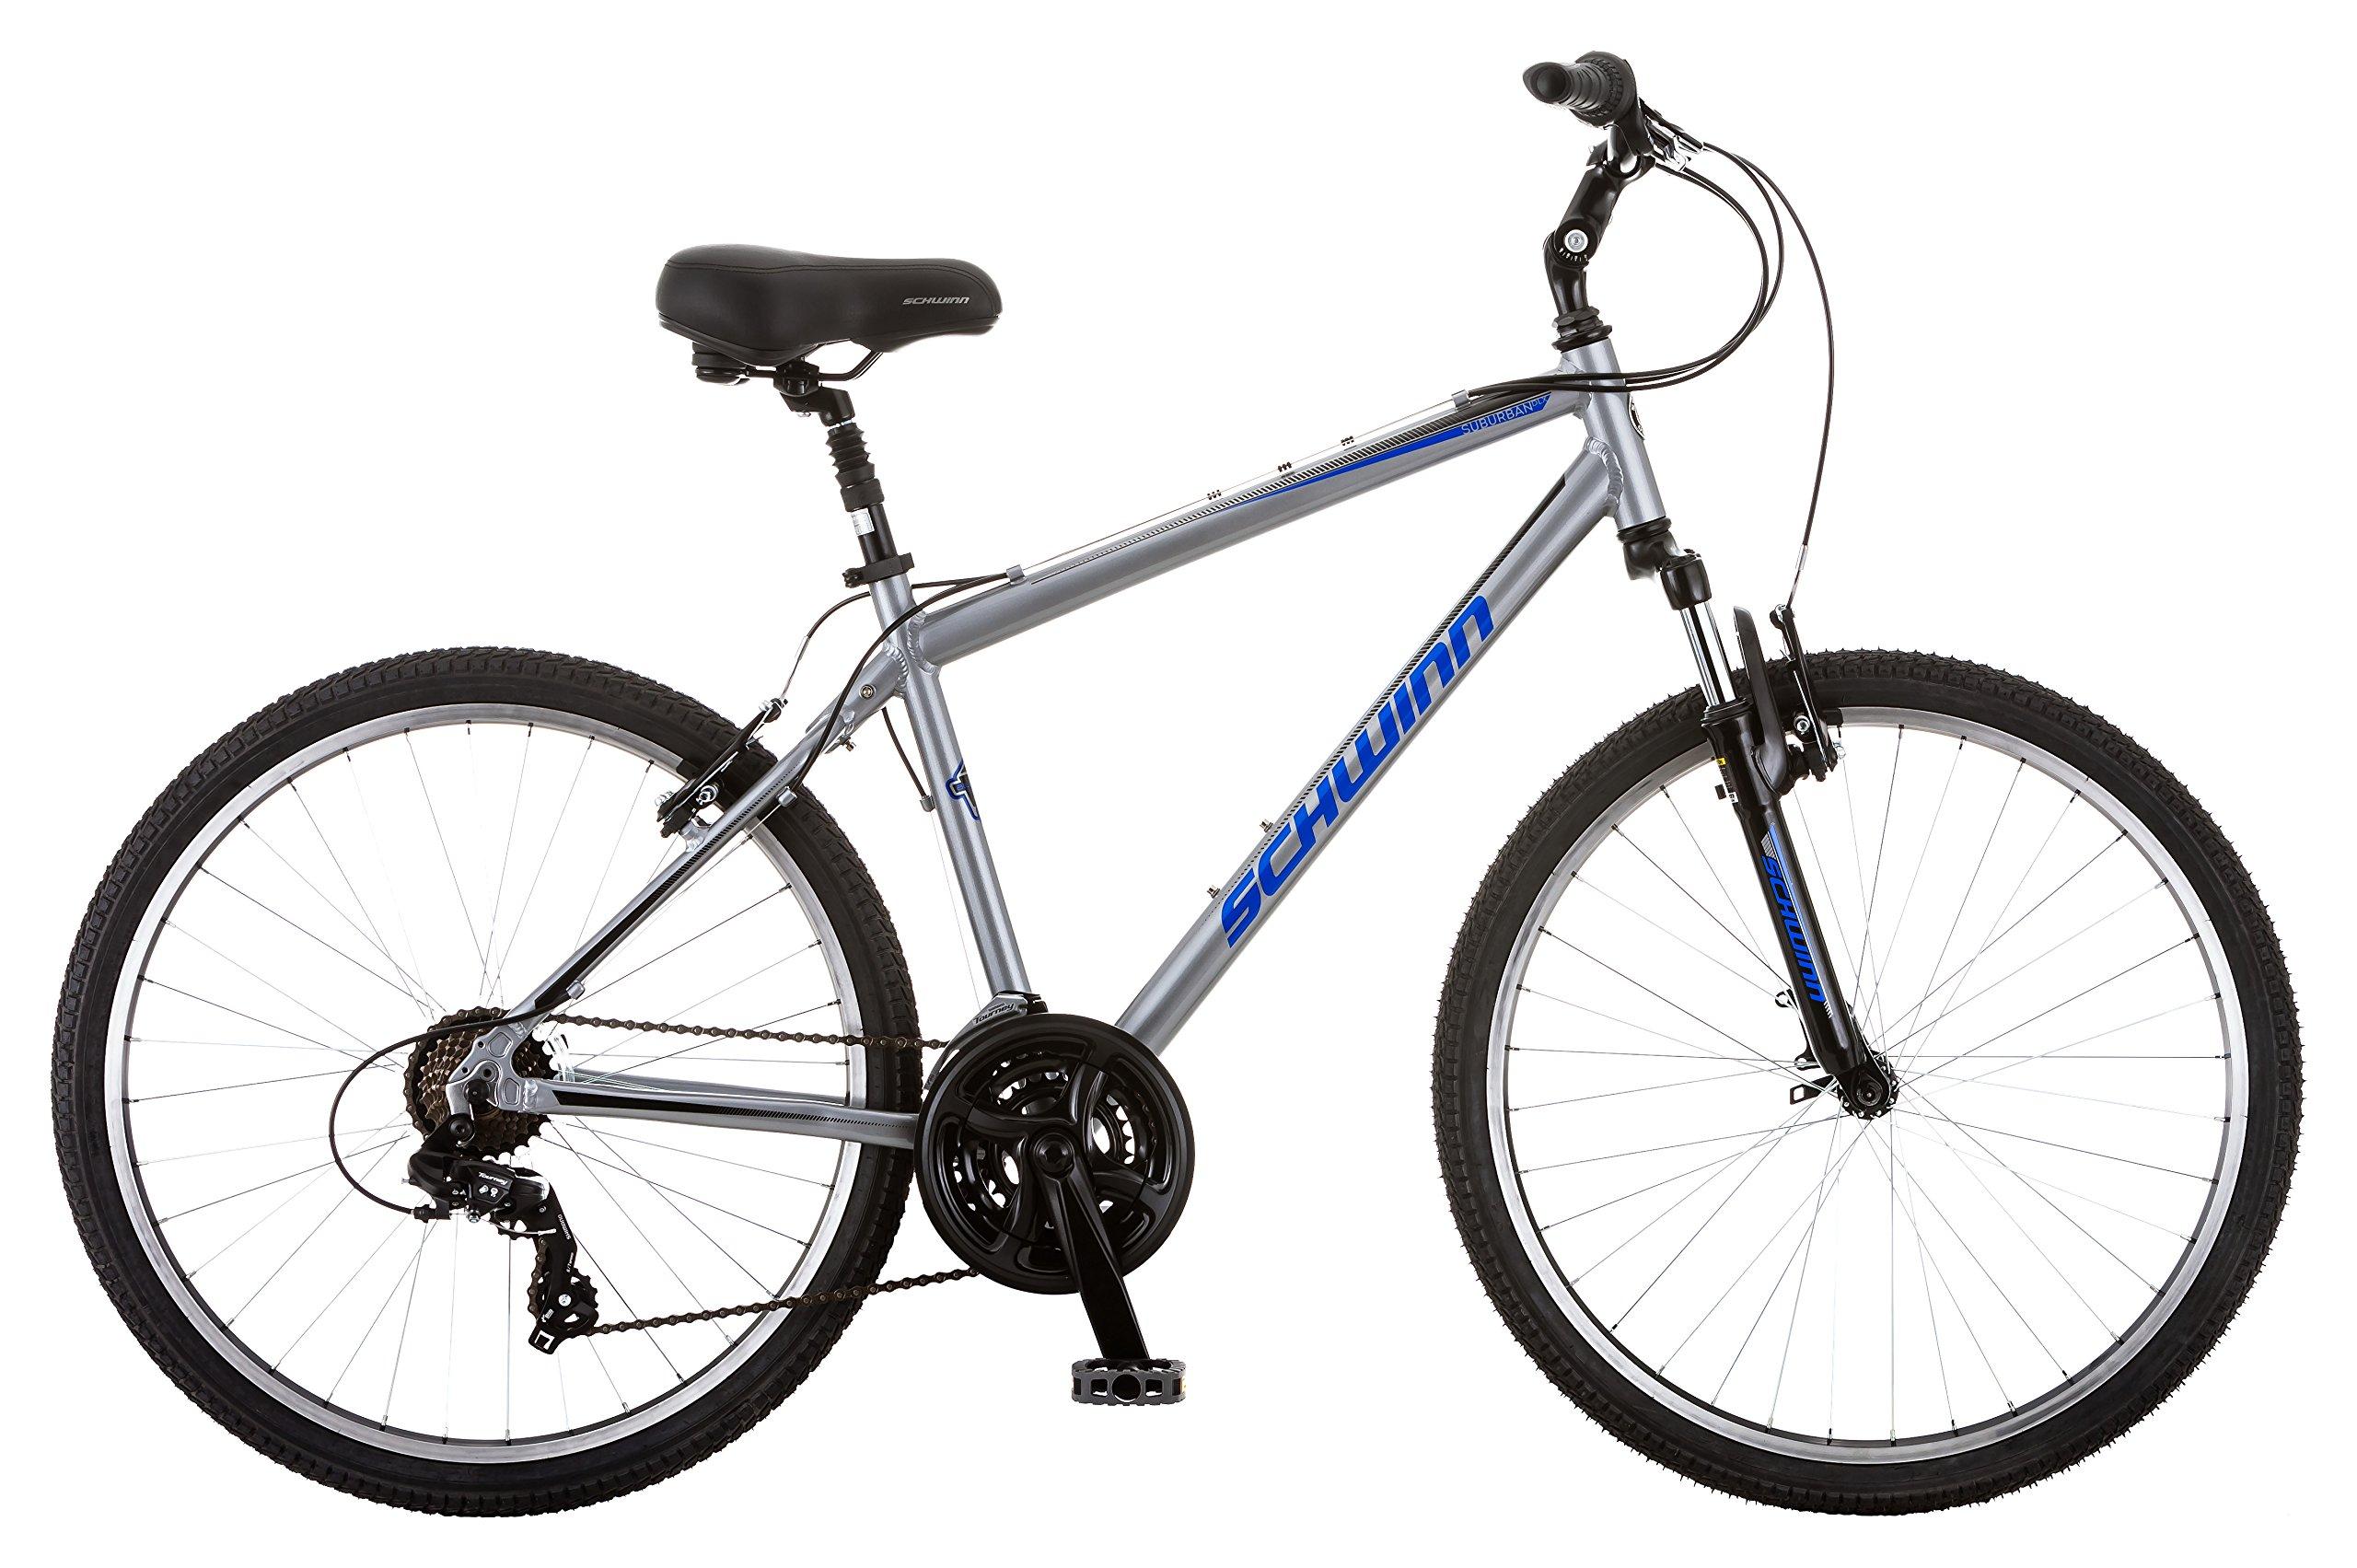 Schwinn Suburban Deluxe Men's Comfort Bike 26'' Wheel Bicycle, Grey, 18 ''/Medium Frame Size